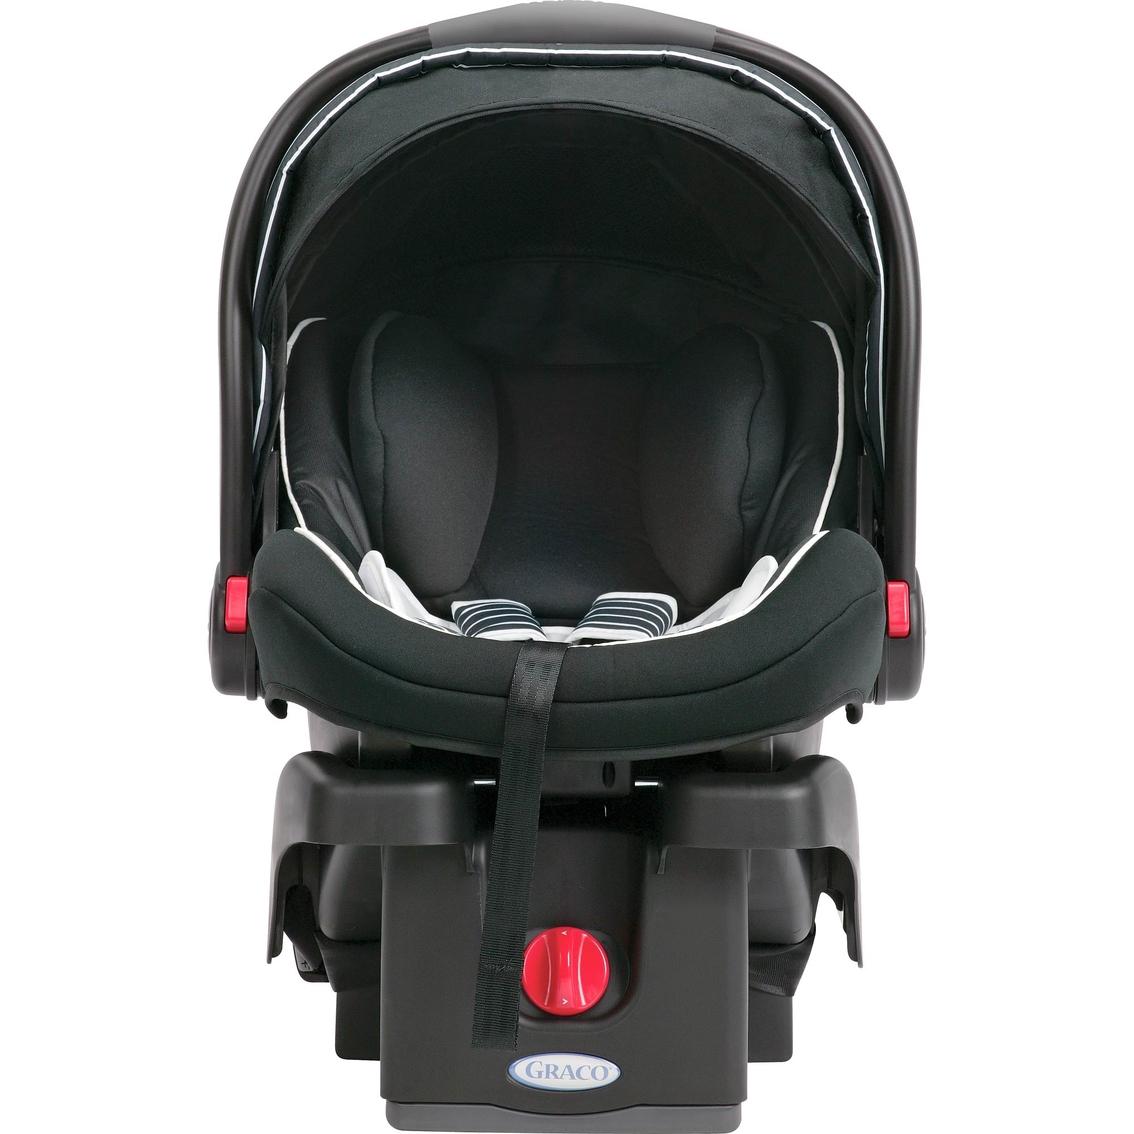 graco snugride click connect 35 lx infant car seat studio infant seats baby toys shop. Black Bedroom Furniture Sets. Home Design Ideas